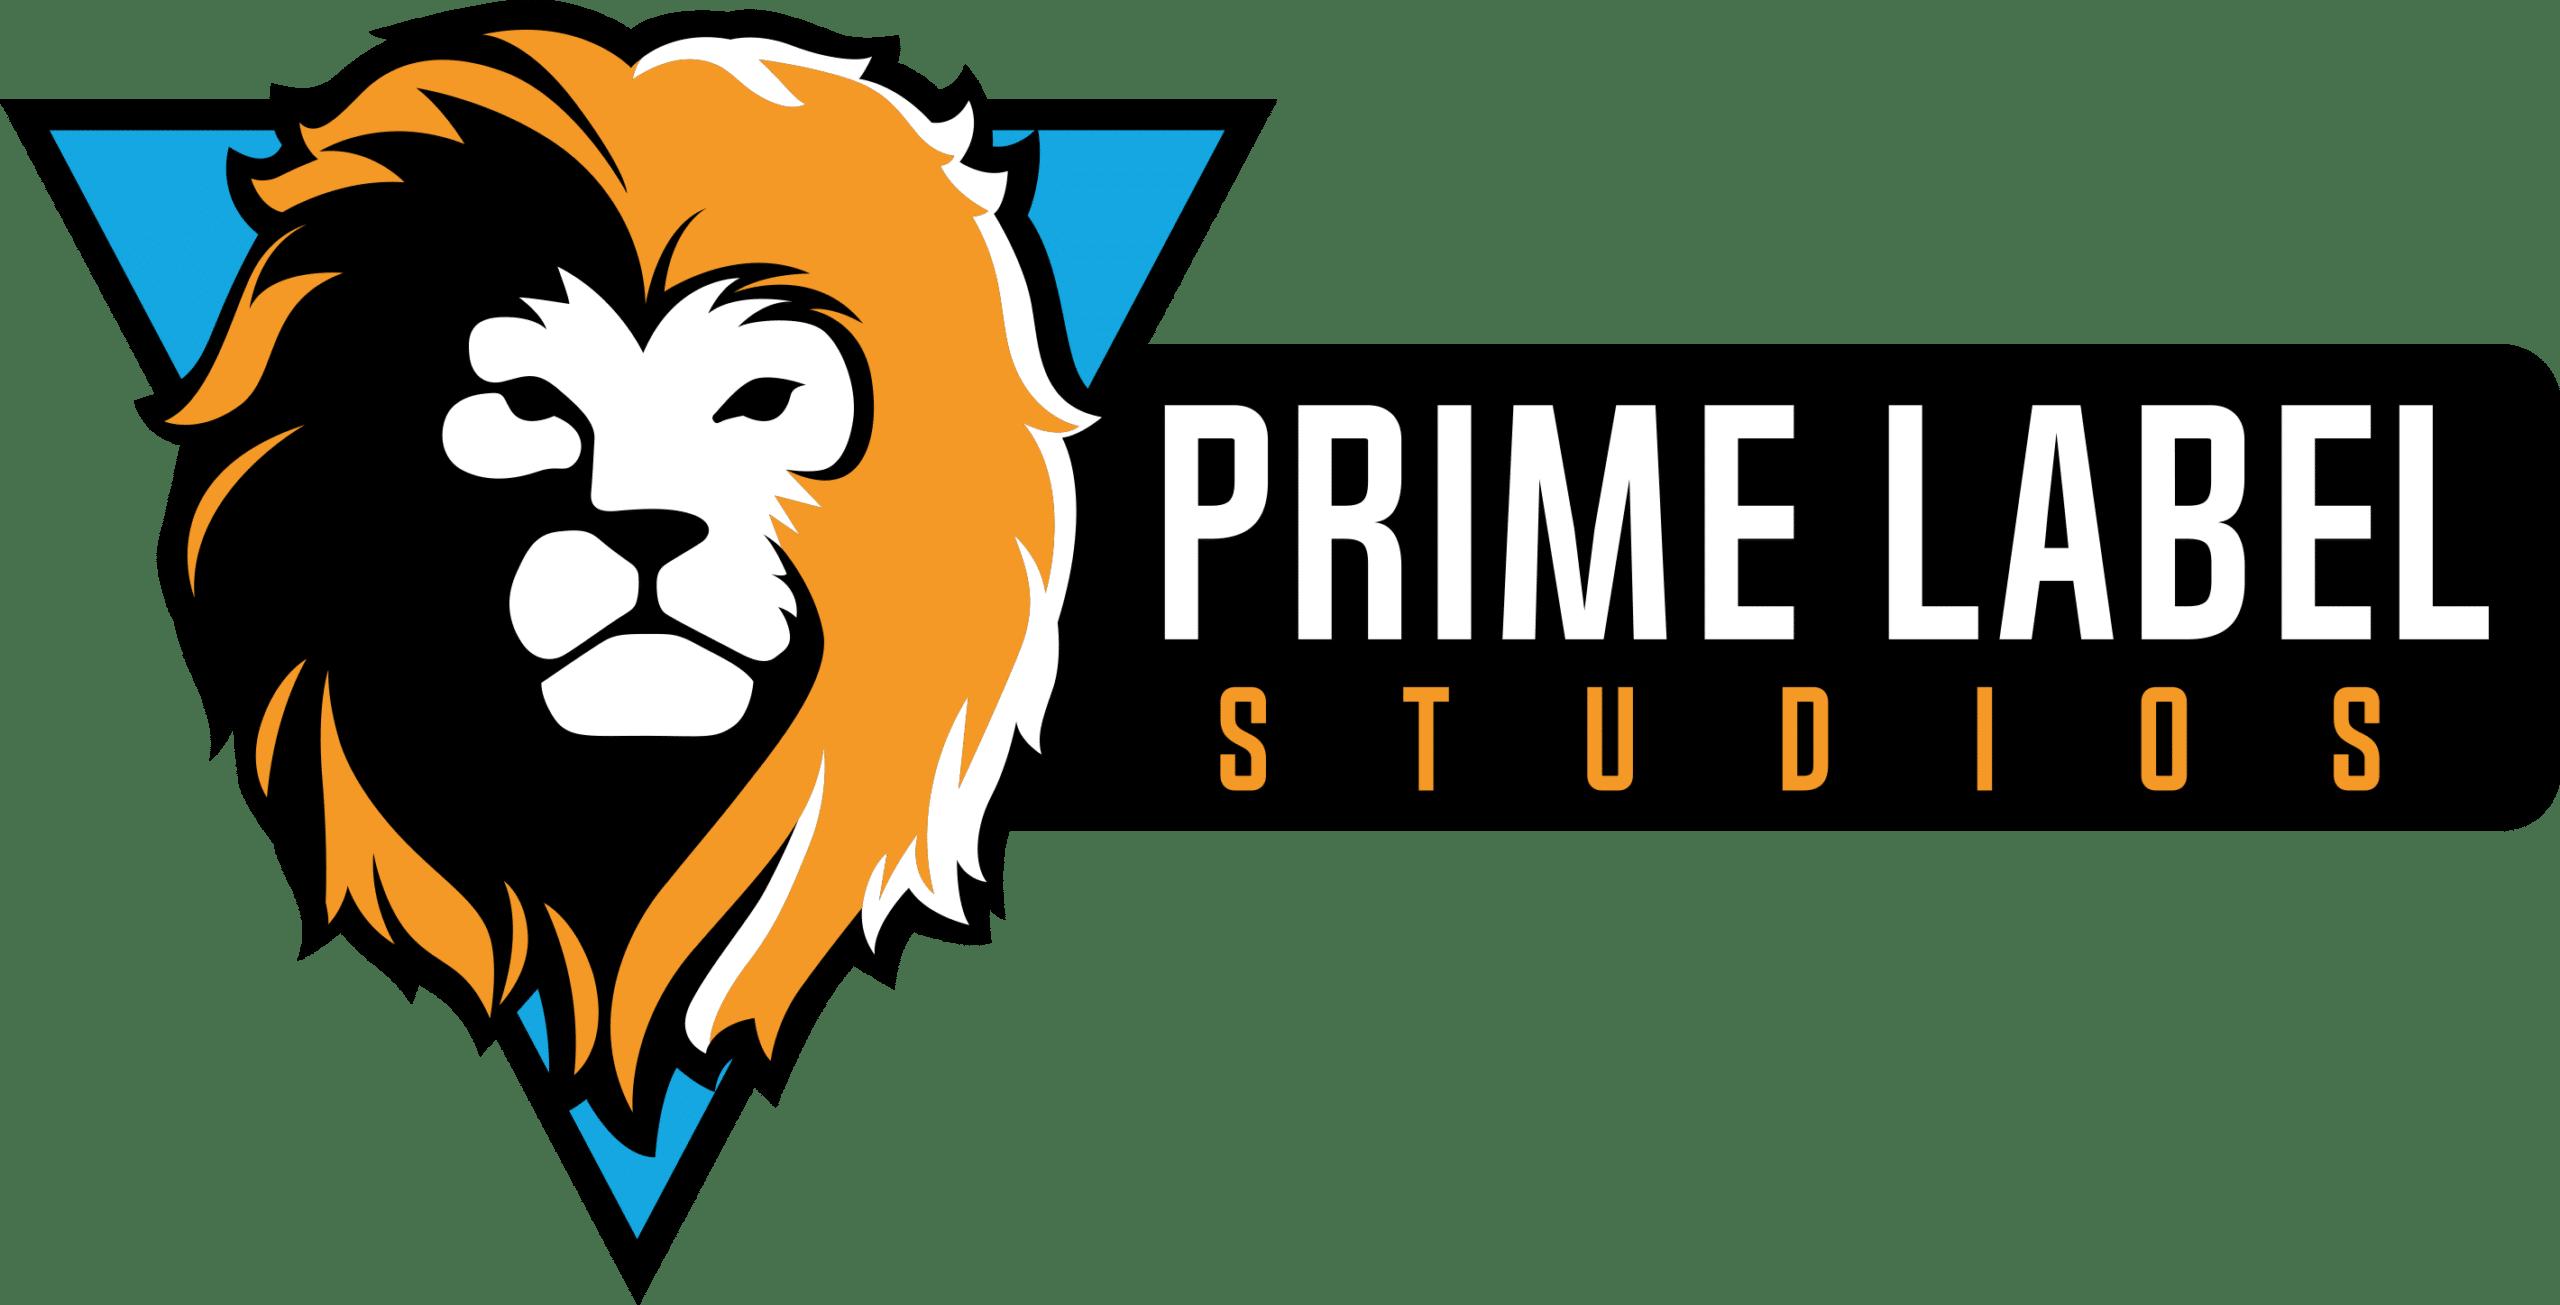 Prime Label Studios